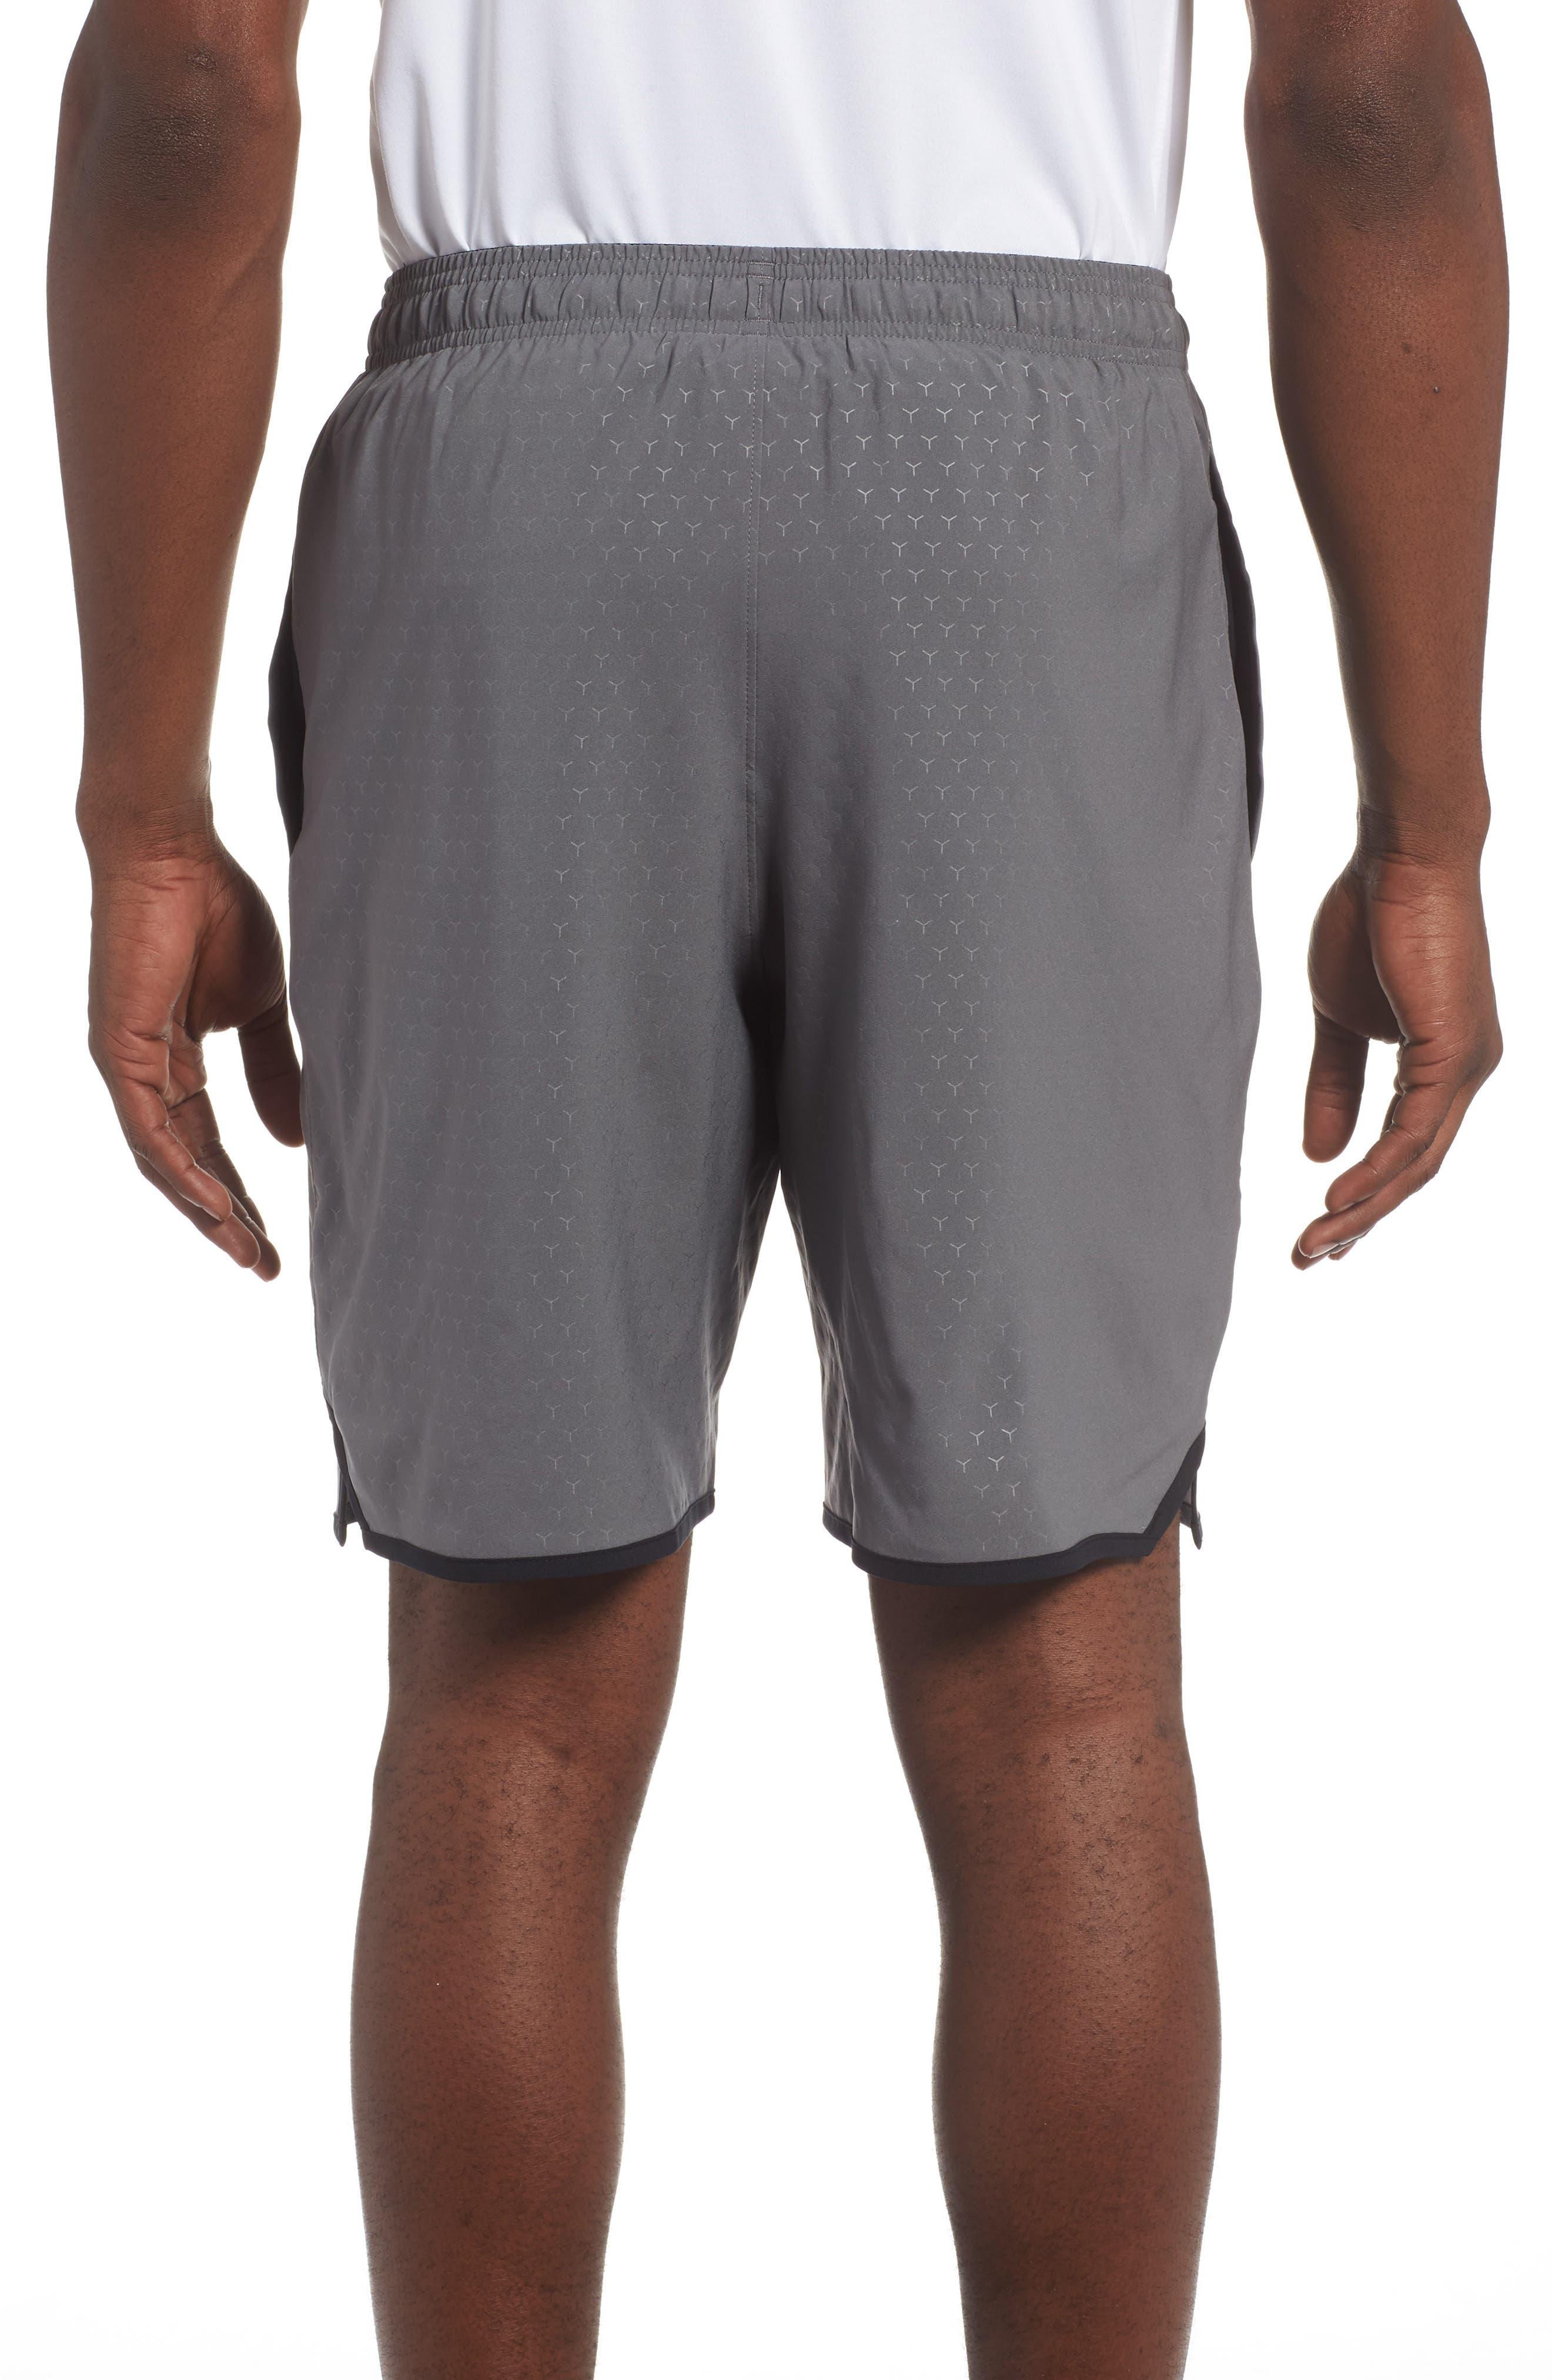 Qualifier Training Shorts,                             Alternate thumbnail 2, color,                             Graphite/ Black